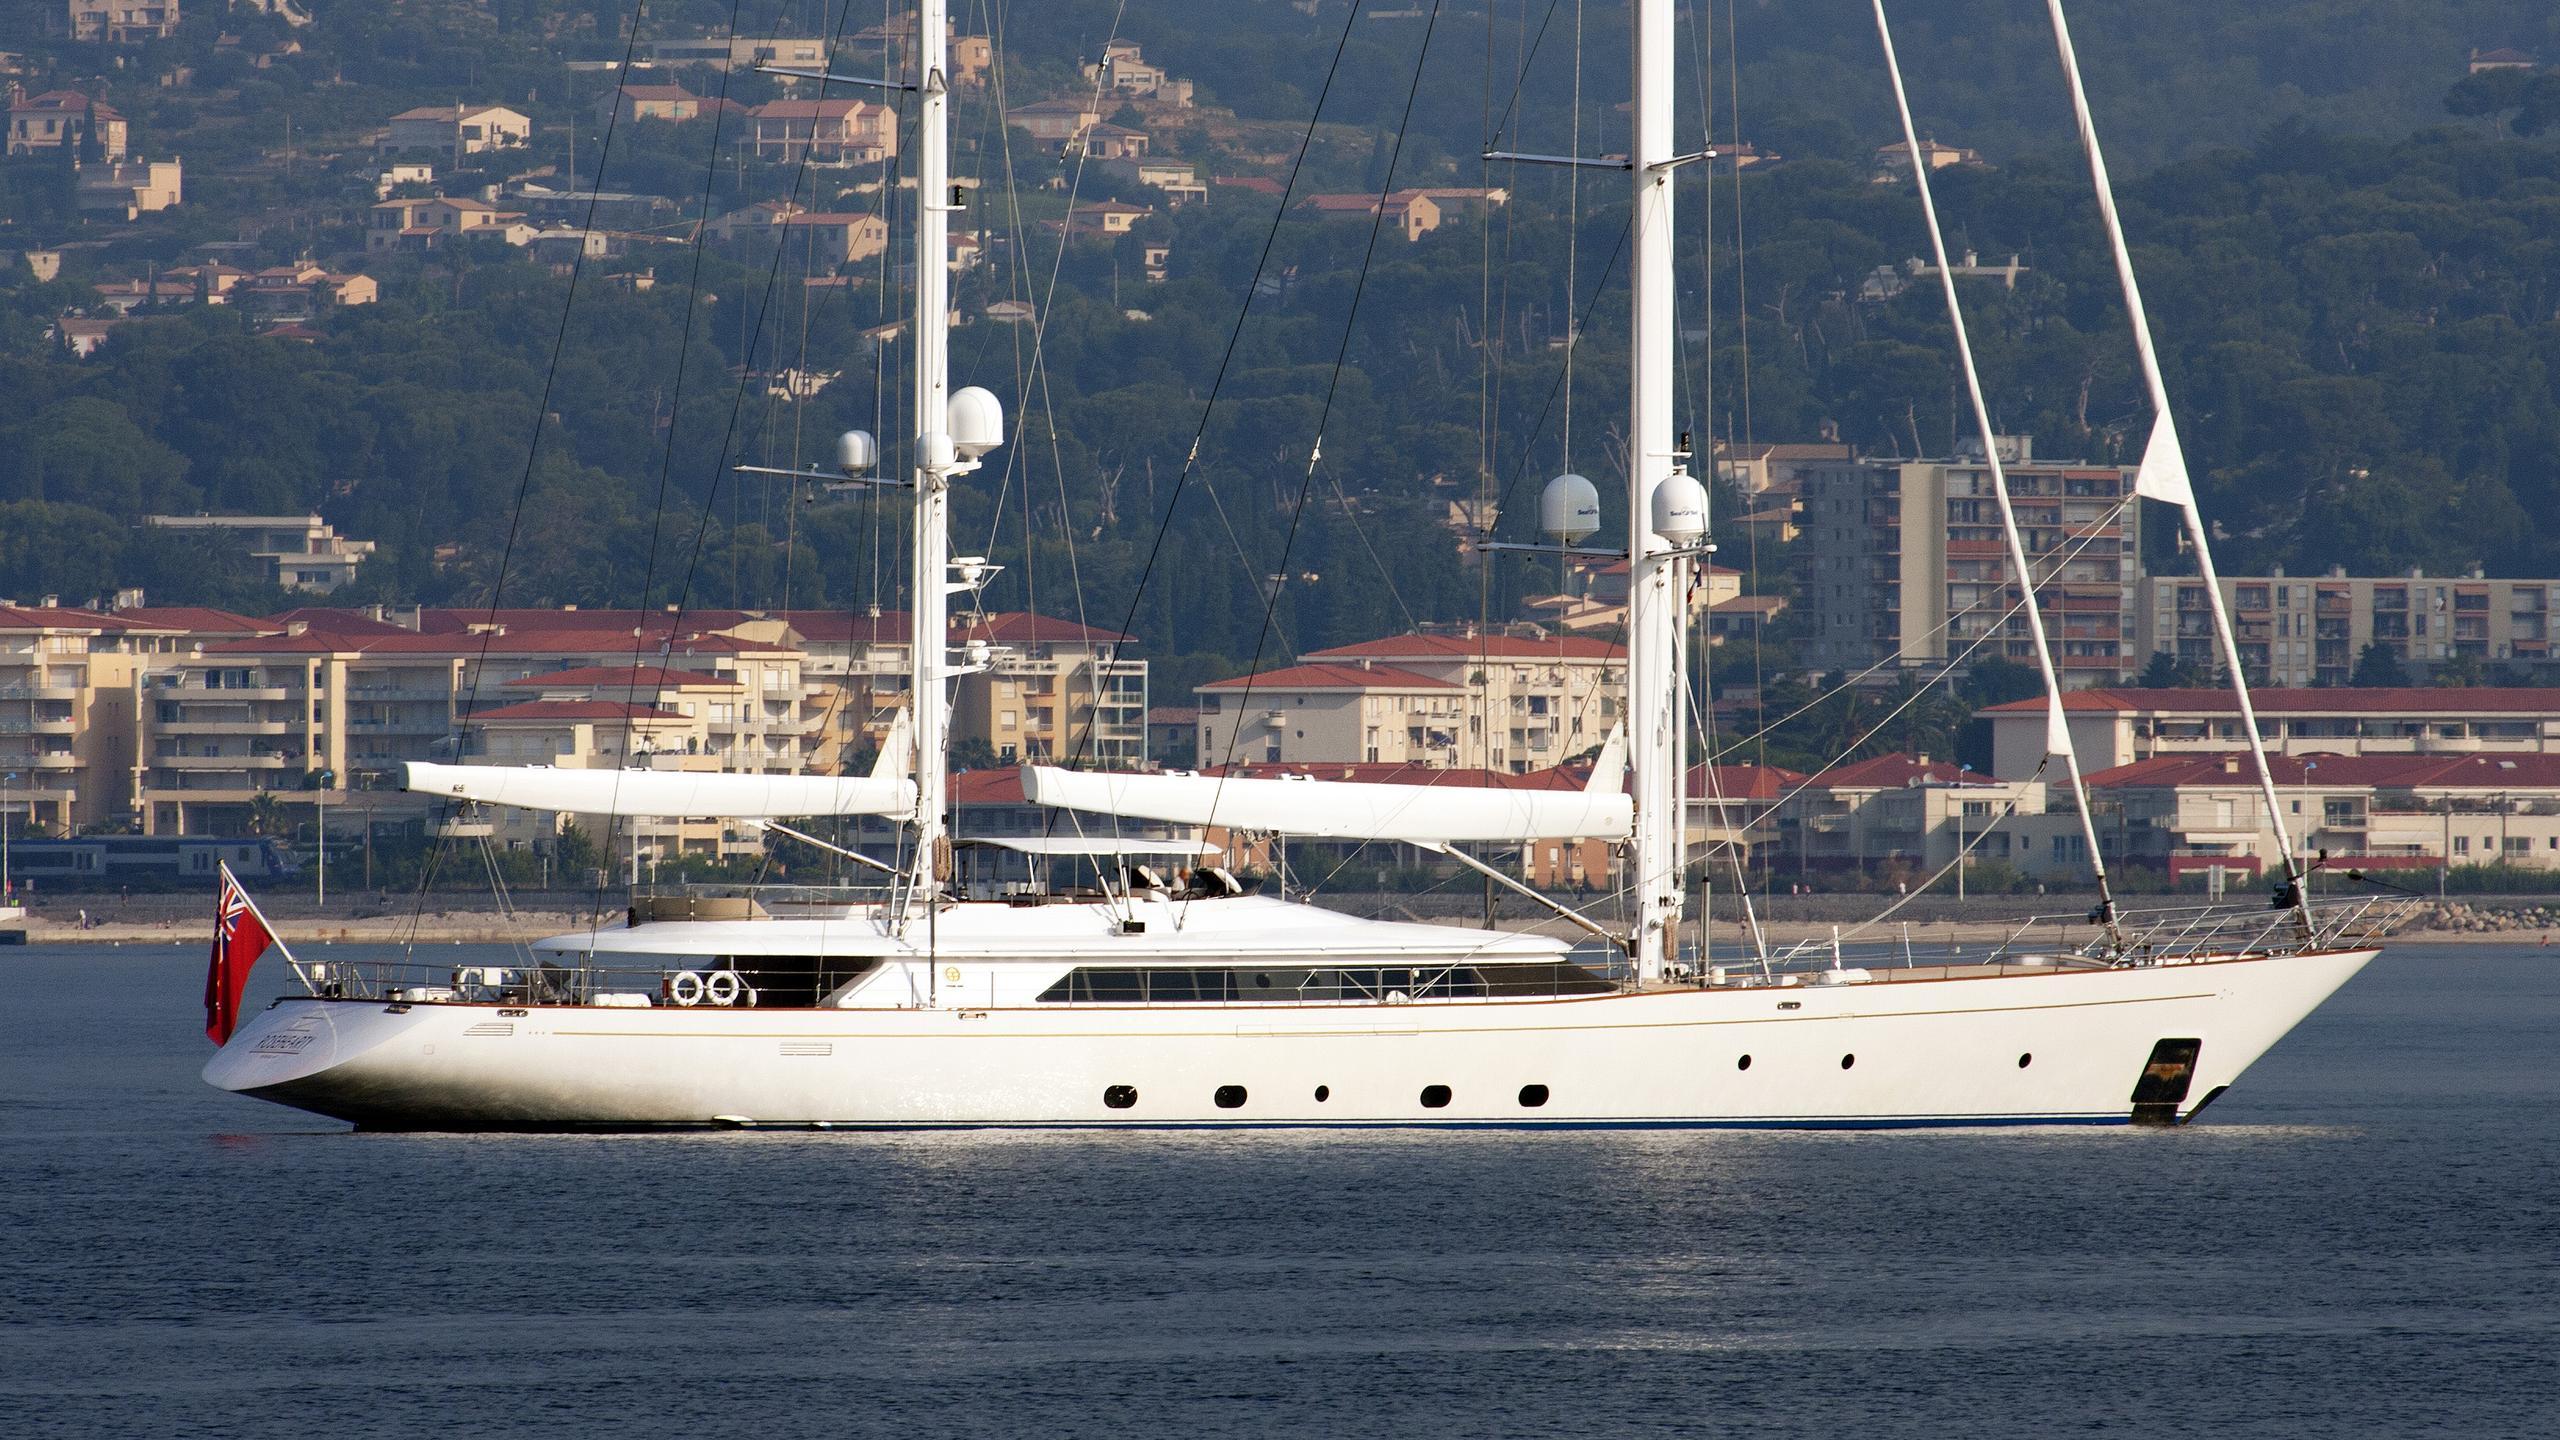 rosehearty-sailing-yacht-perini-navi-2006-56m-profile